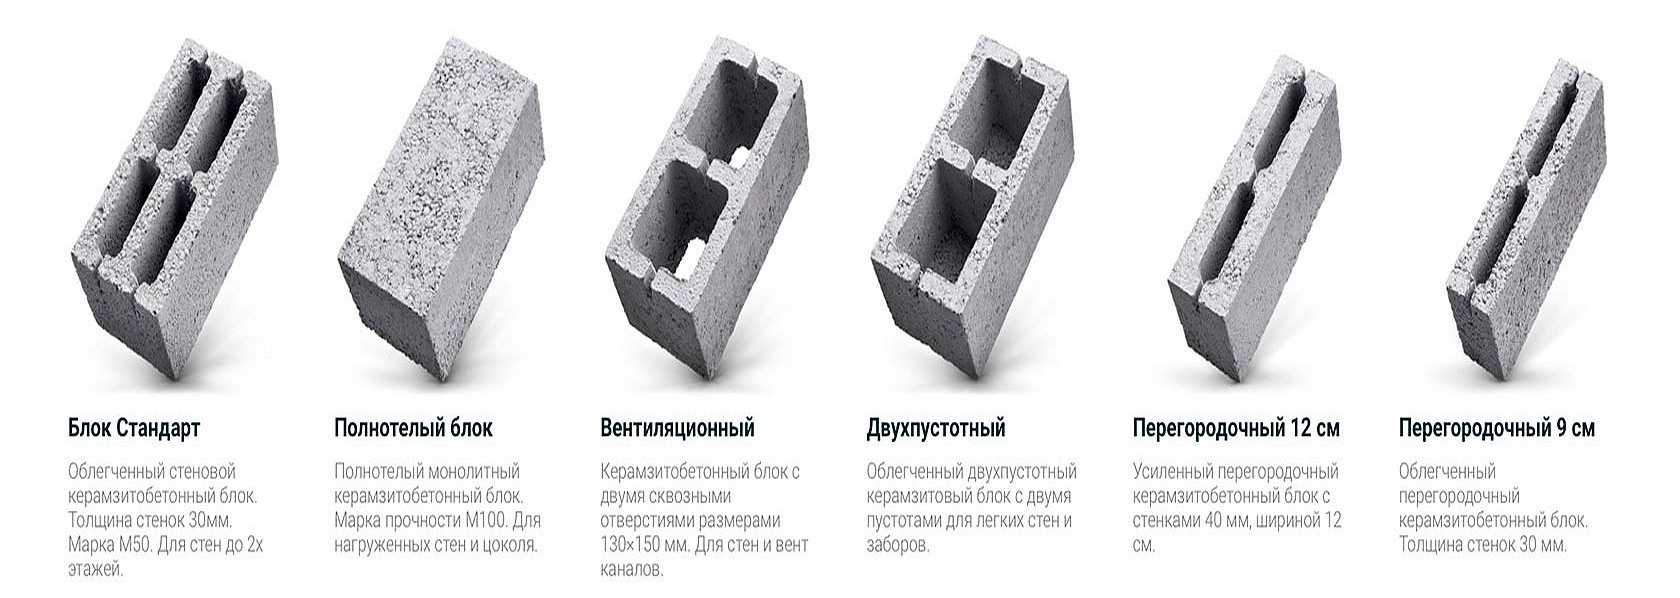 Размер блока керамзитобетона определяется стандартами